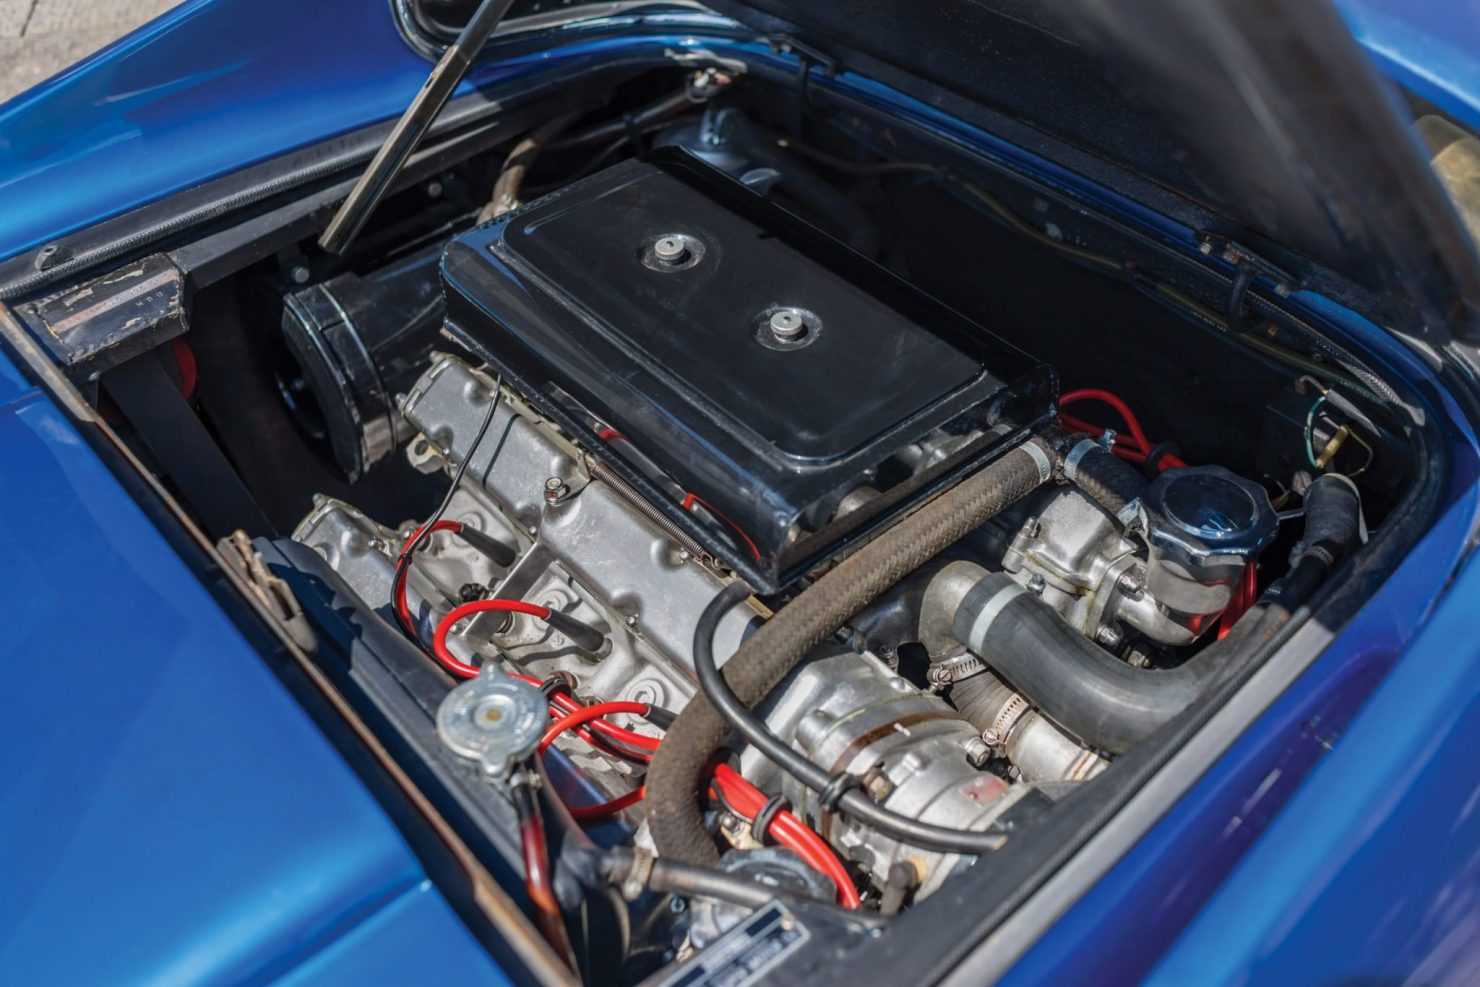 ferrari dino 246 gts car 21 1480x987 - 1973 Ferrari Dino 246 GTS